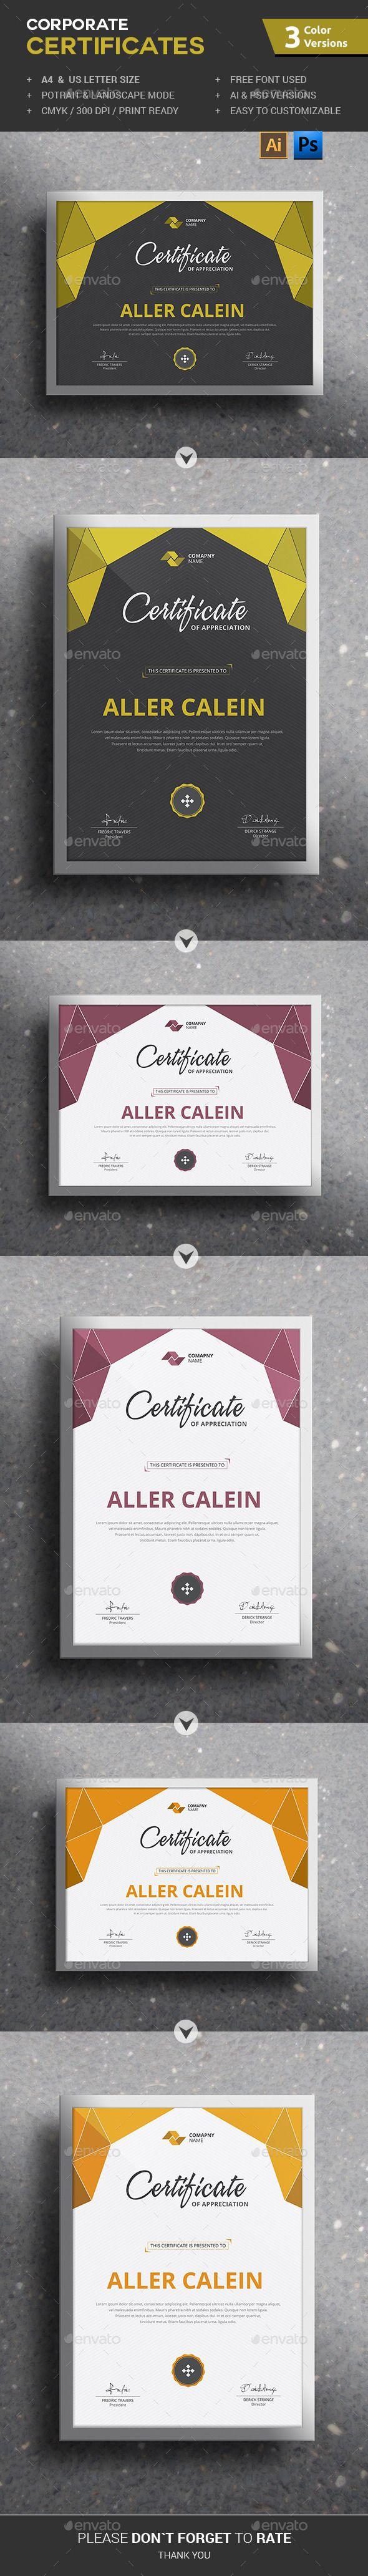 Corporate Certificates | Urkunden